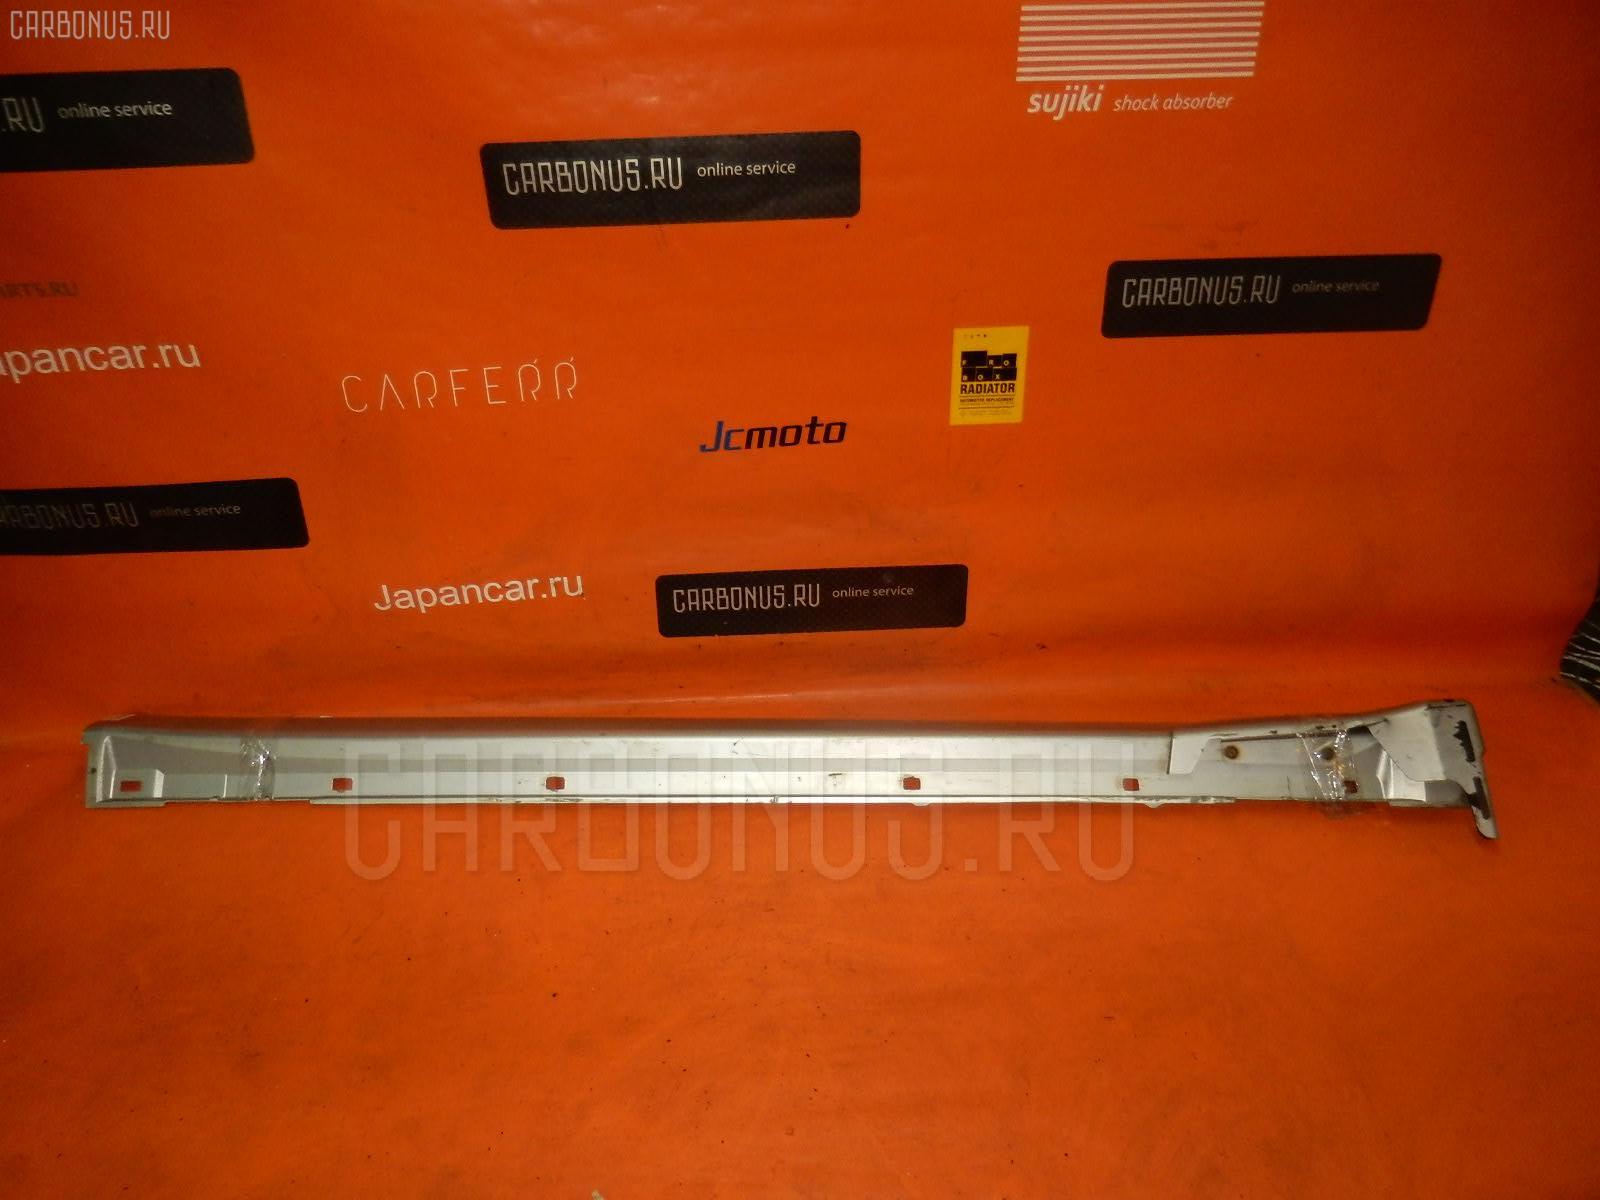 Порог кузова пластиковый ( обвес ) SUBARU LEGACY BL5 Фото 1